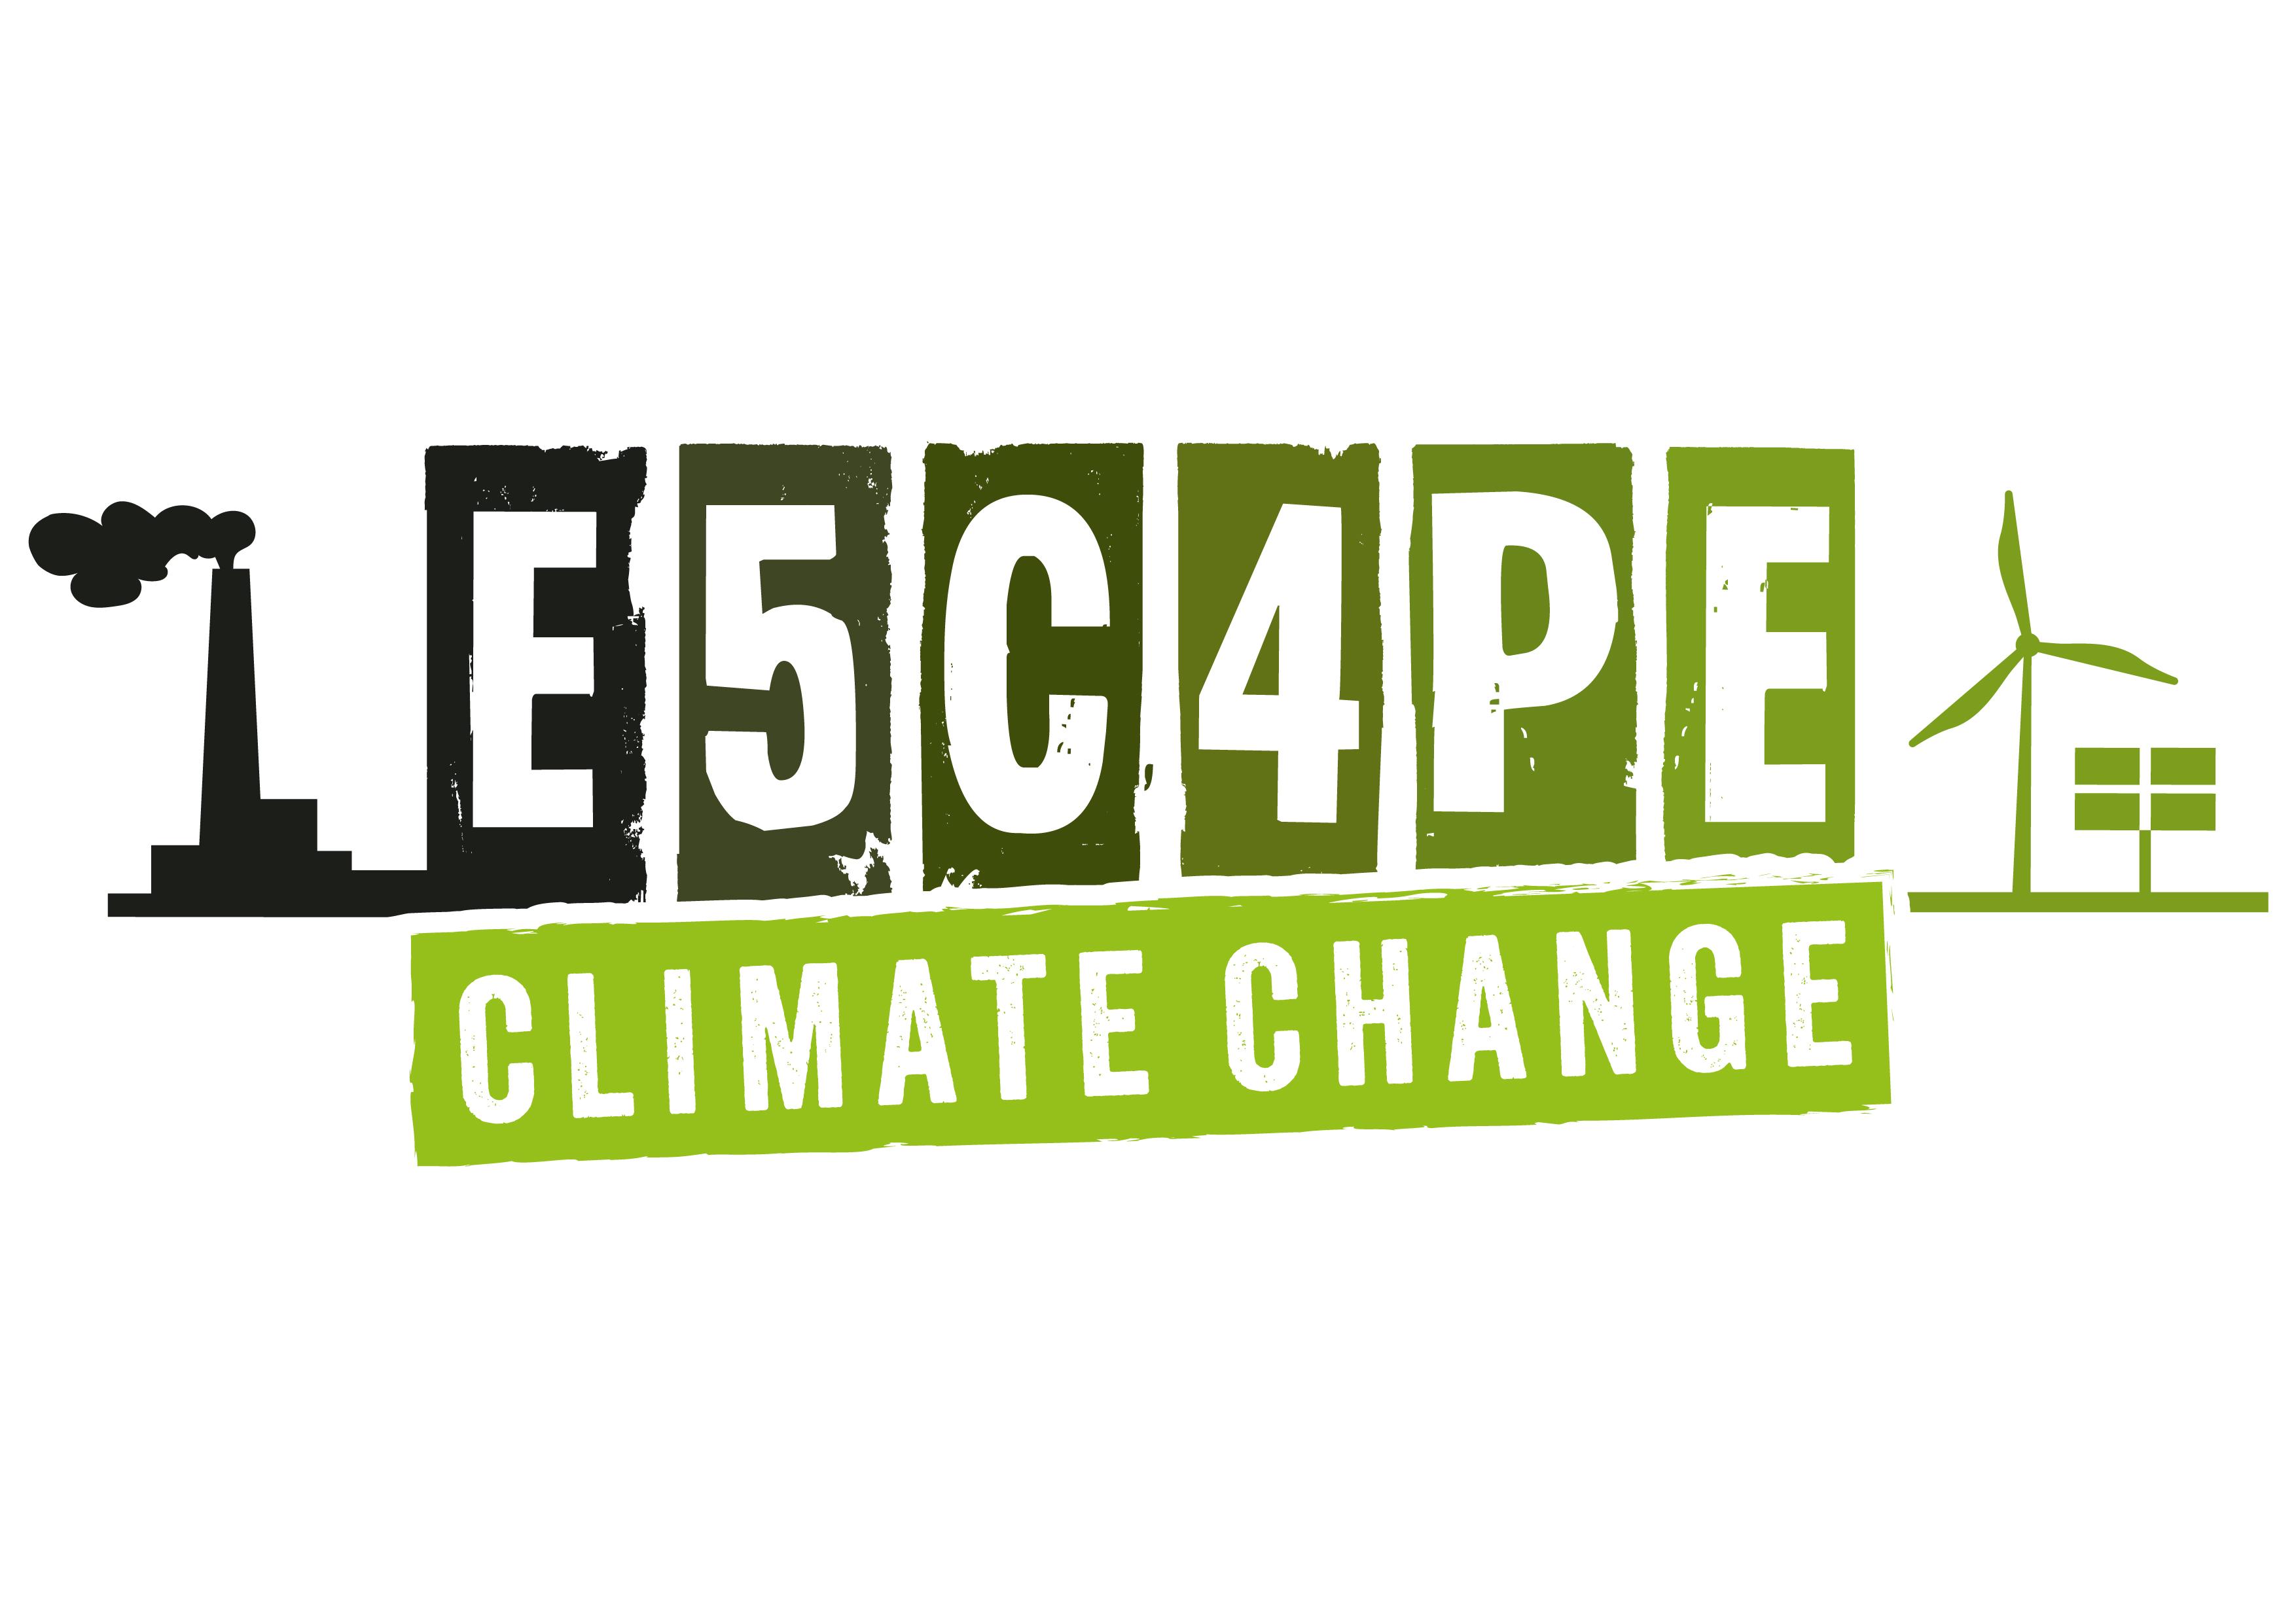 Escape Climate Change - Knack den Klima Code!